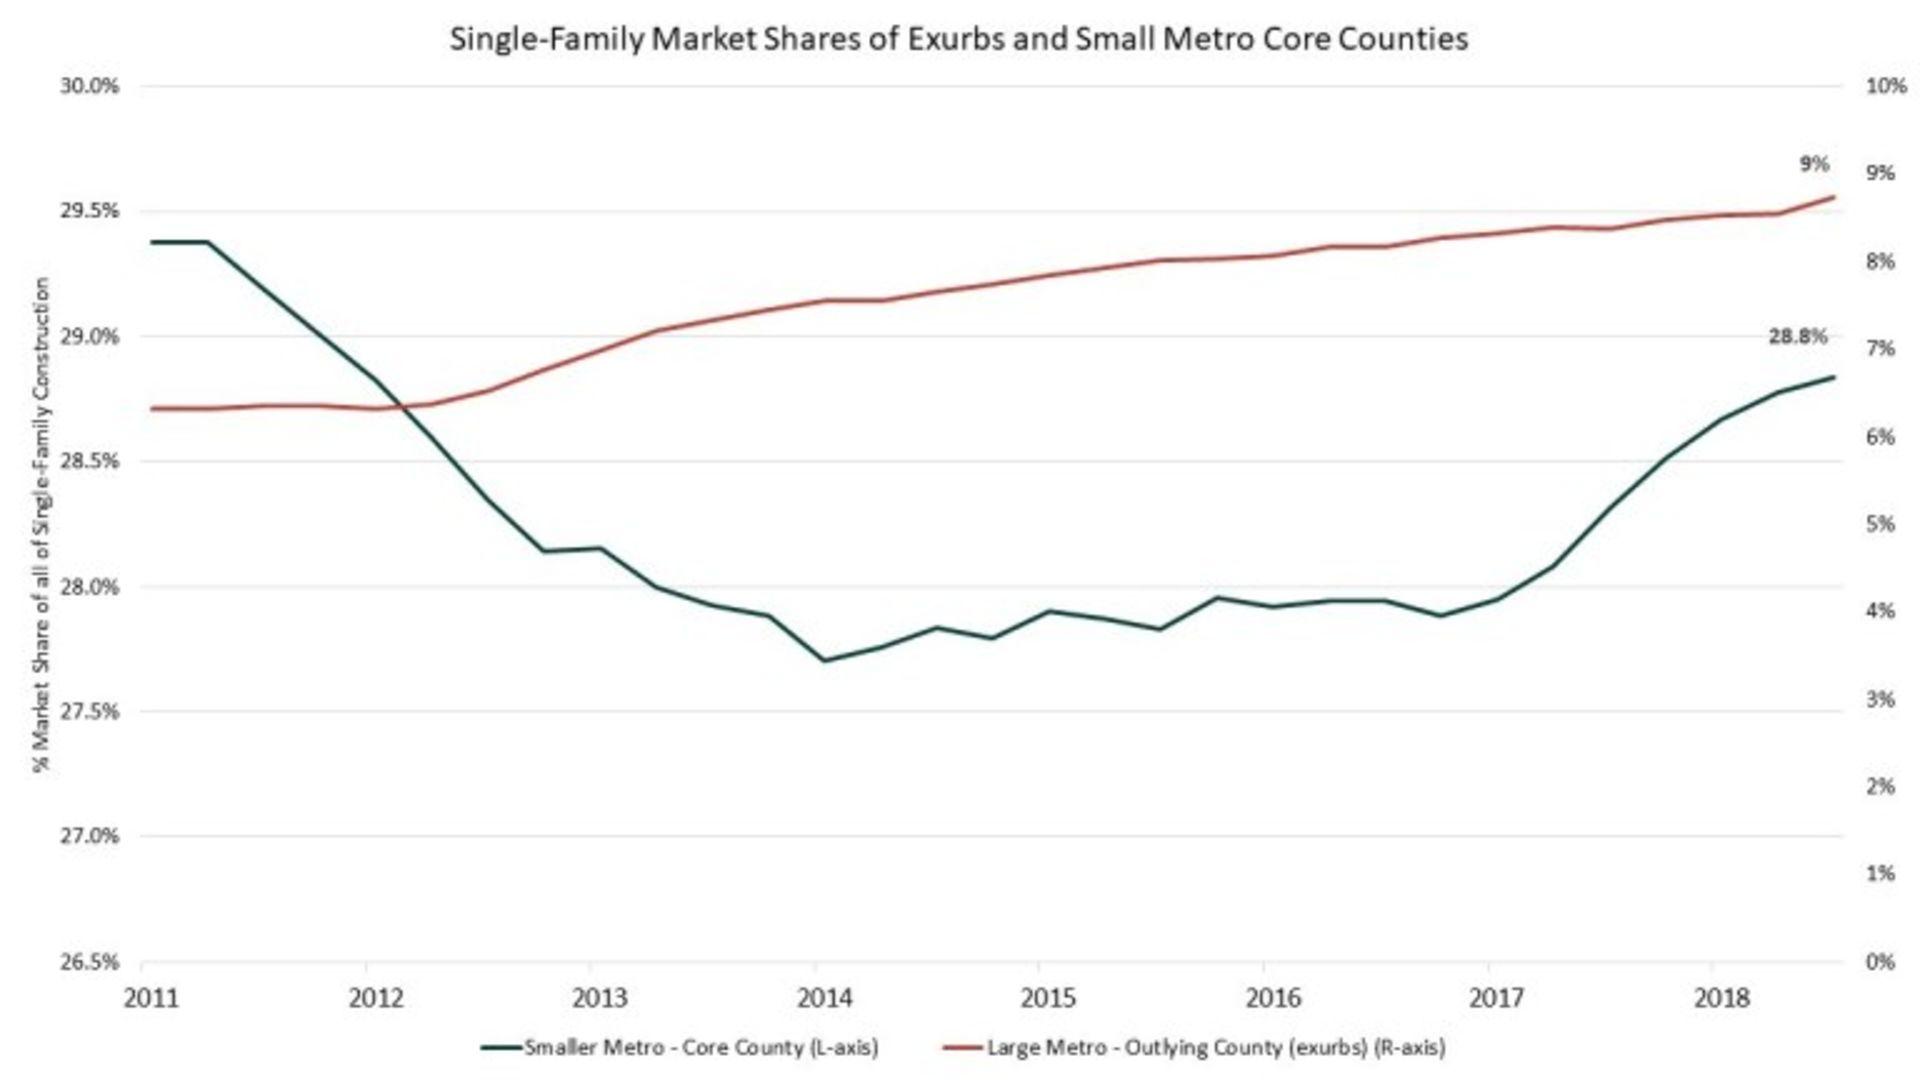 Single-Family Market Share Change